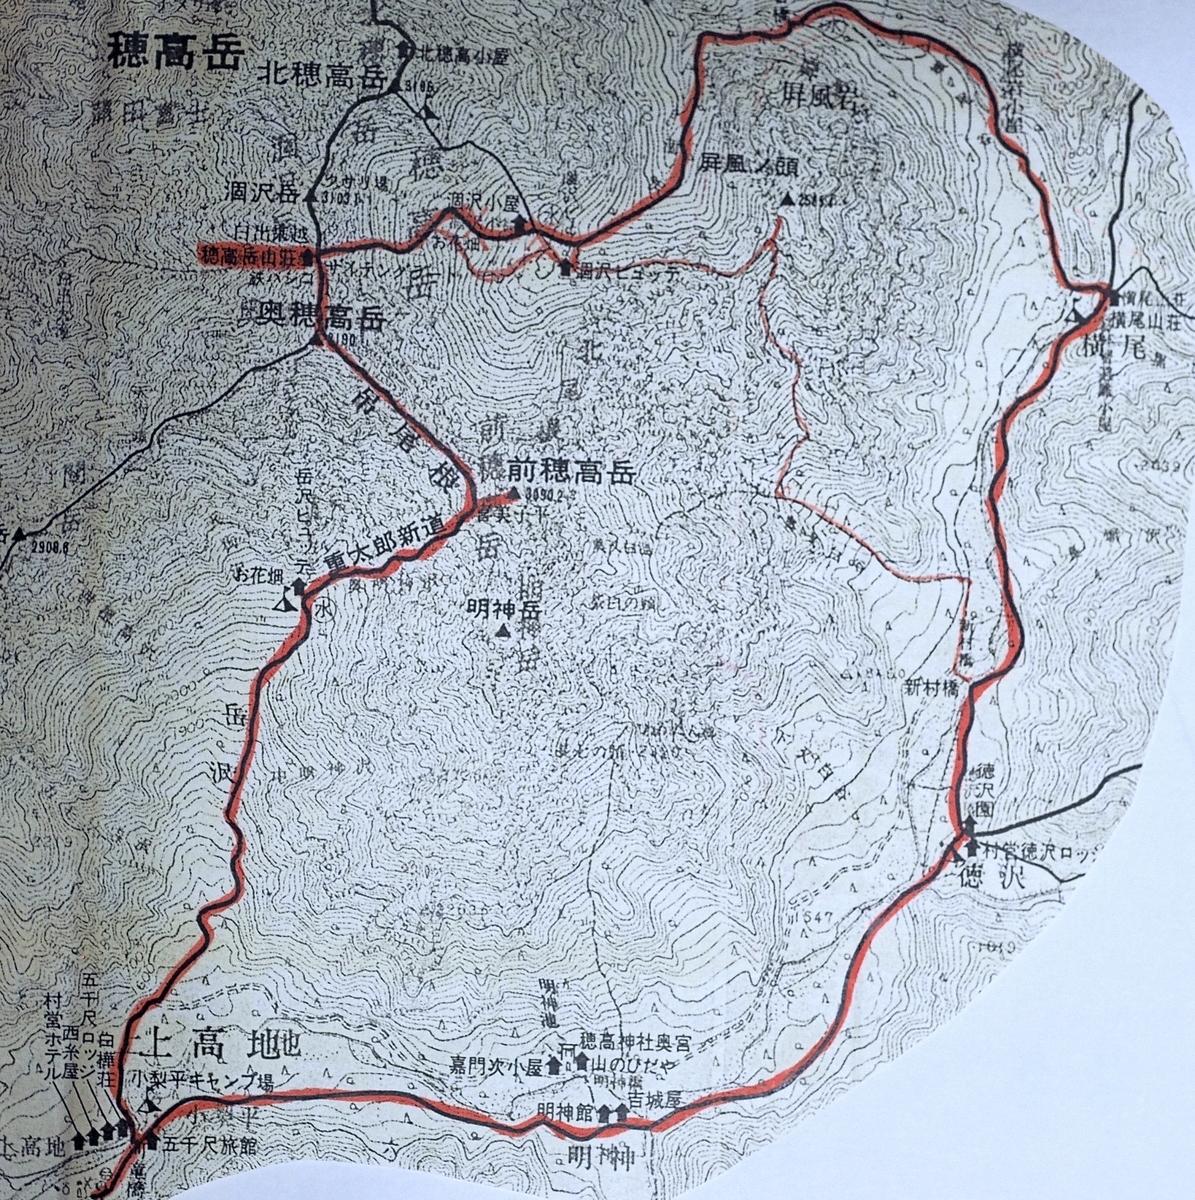 f:id:Hakuto-MA:20210602221309j:plain